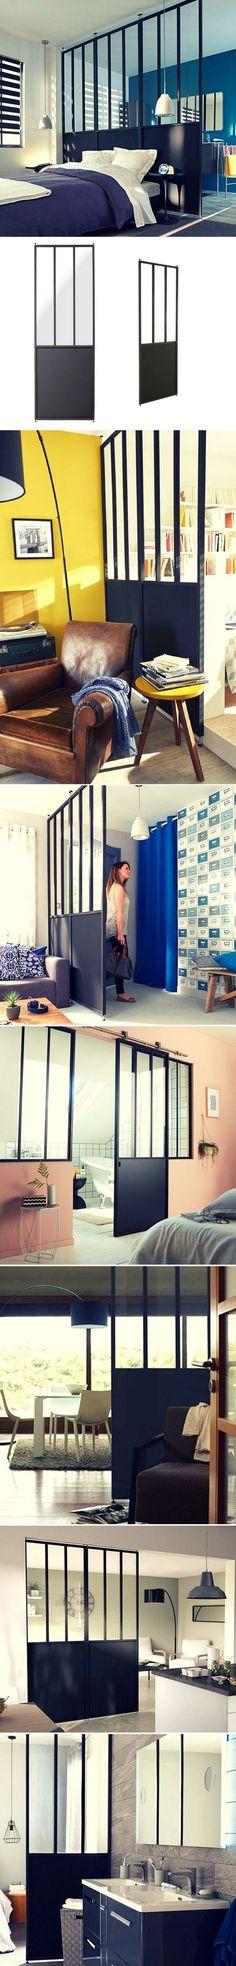 o trouver une porte coulissante atelier style verri re porte coulissante atelier porte. Black Bedroom Furniture Sets. Home Design Ideas